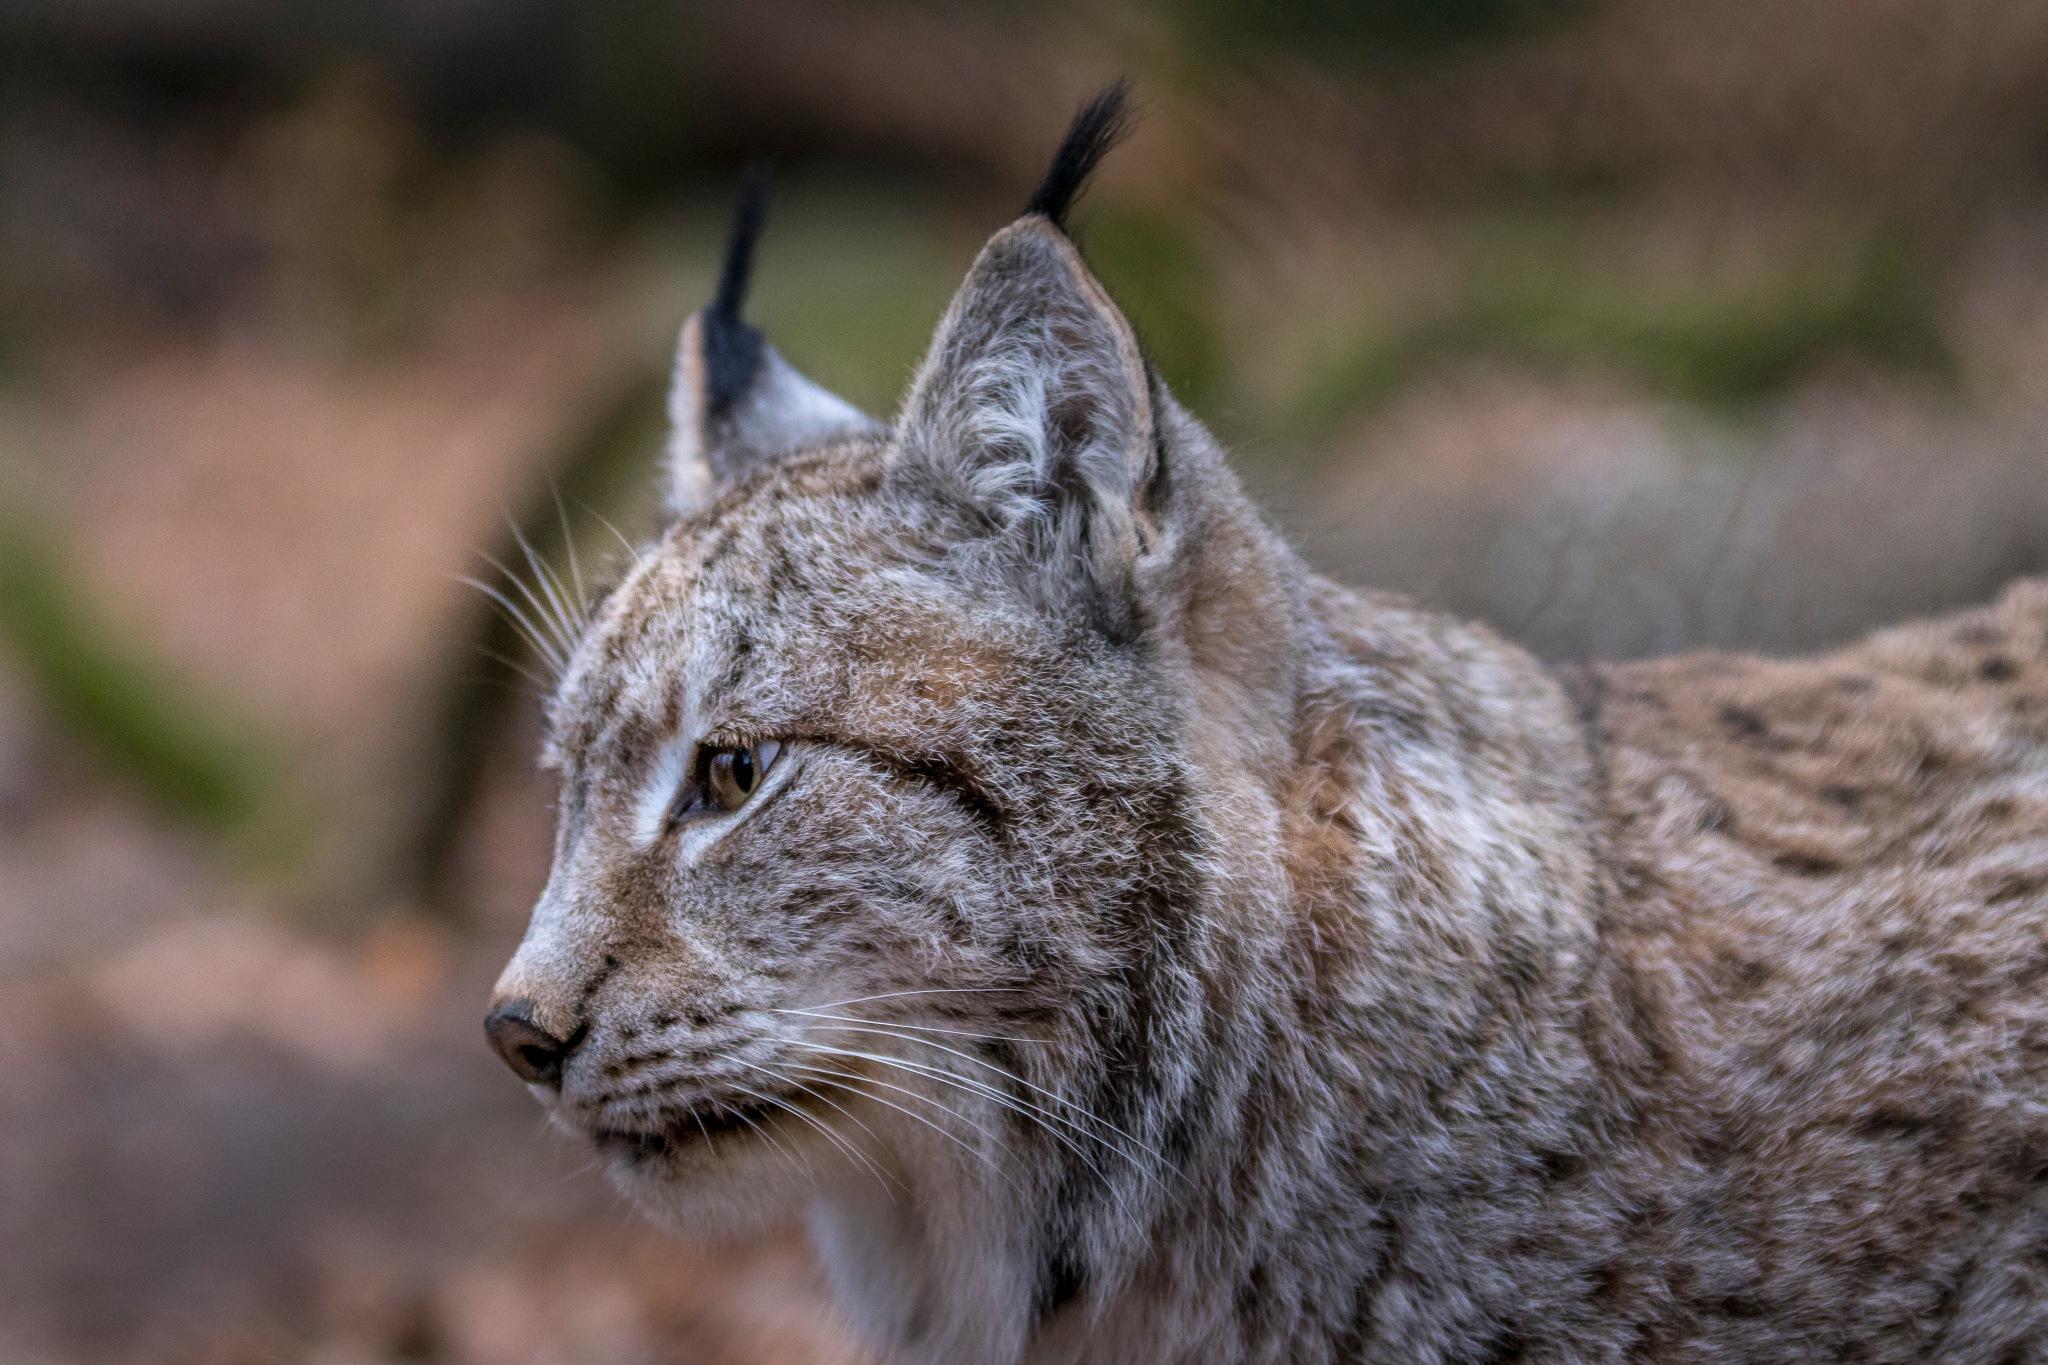 Mr Lynx by Kim Jonsson